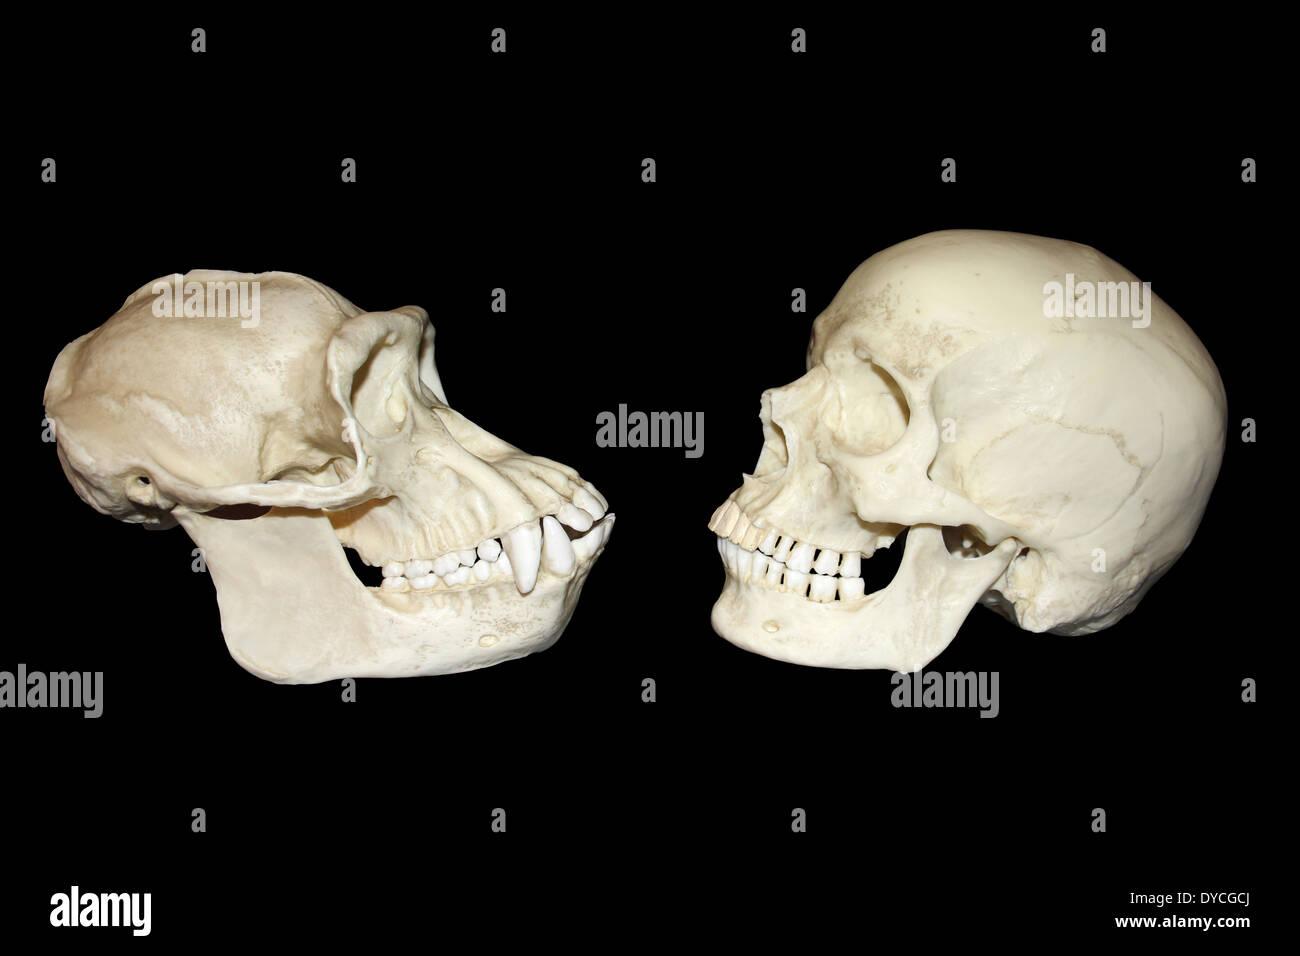 Comparison Between Skull Of Male Chimpanzee And Modern Human Homo sapiens - Stock Image